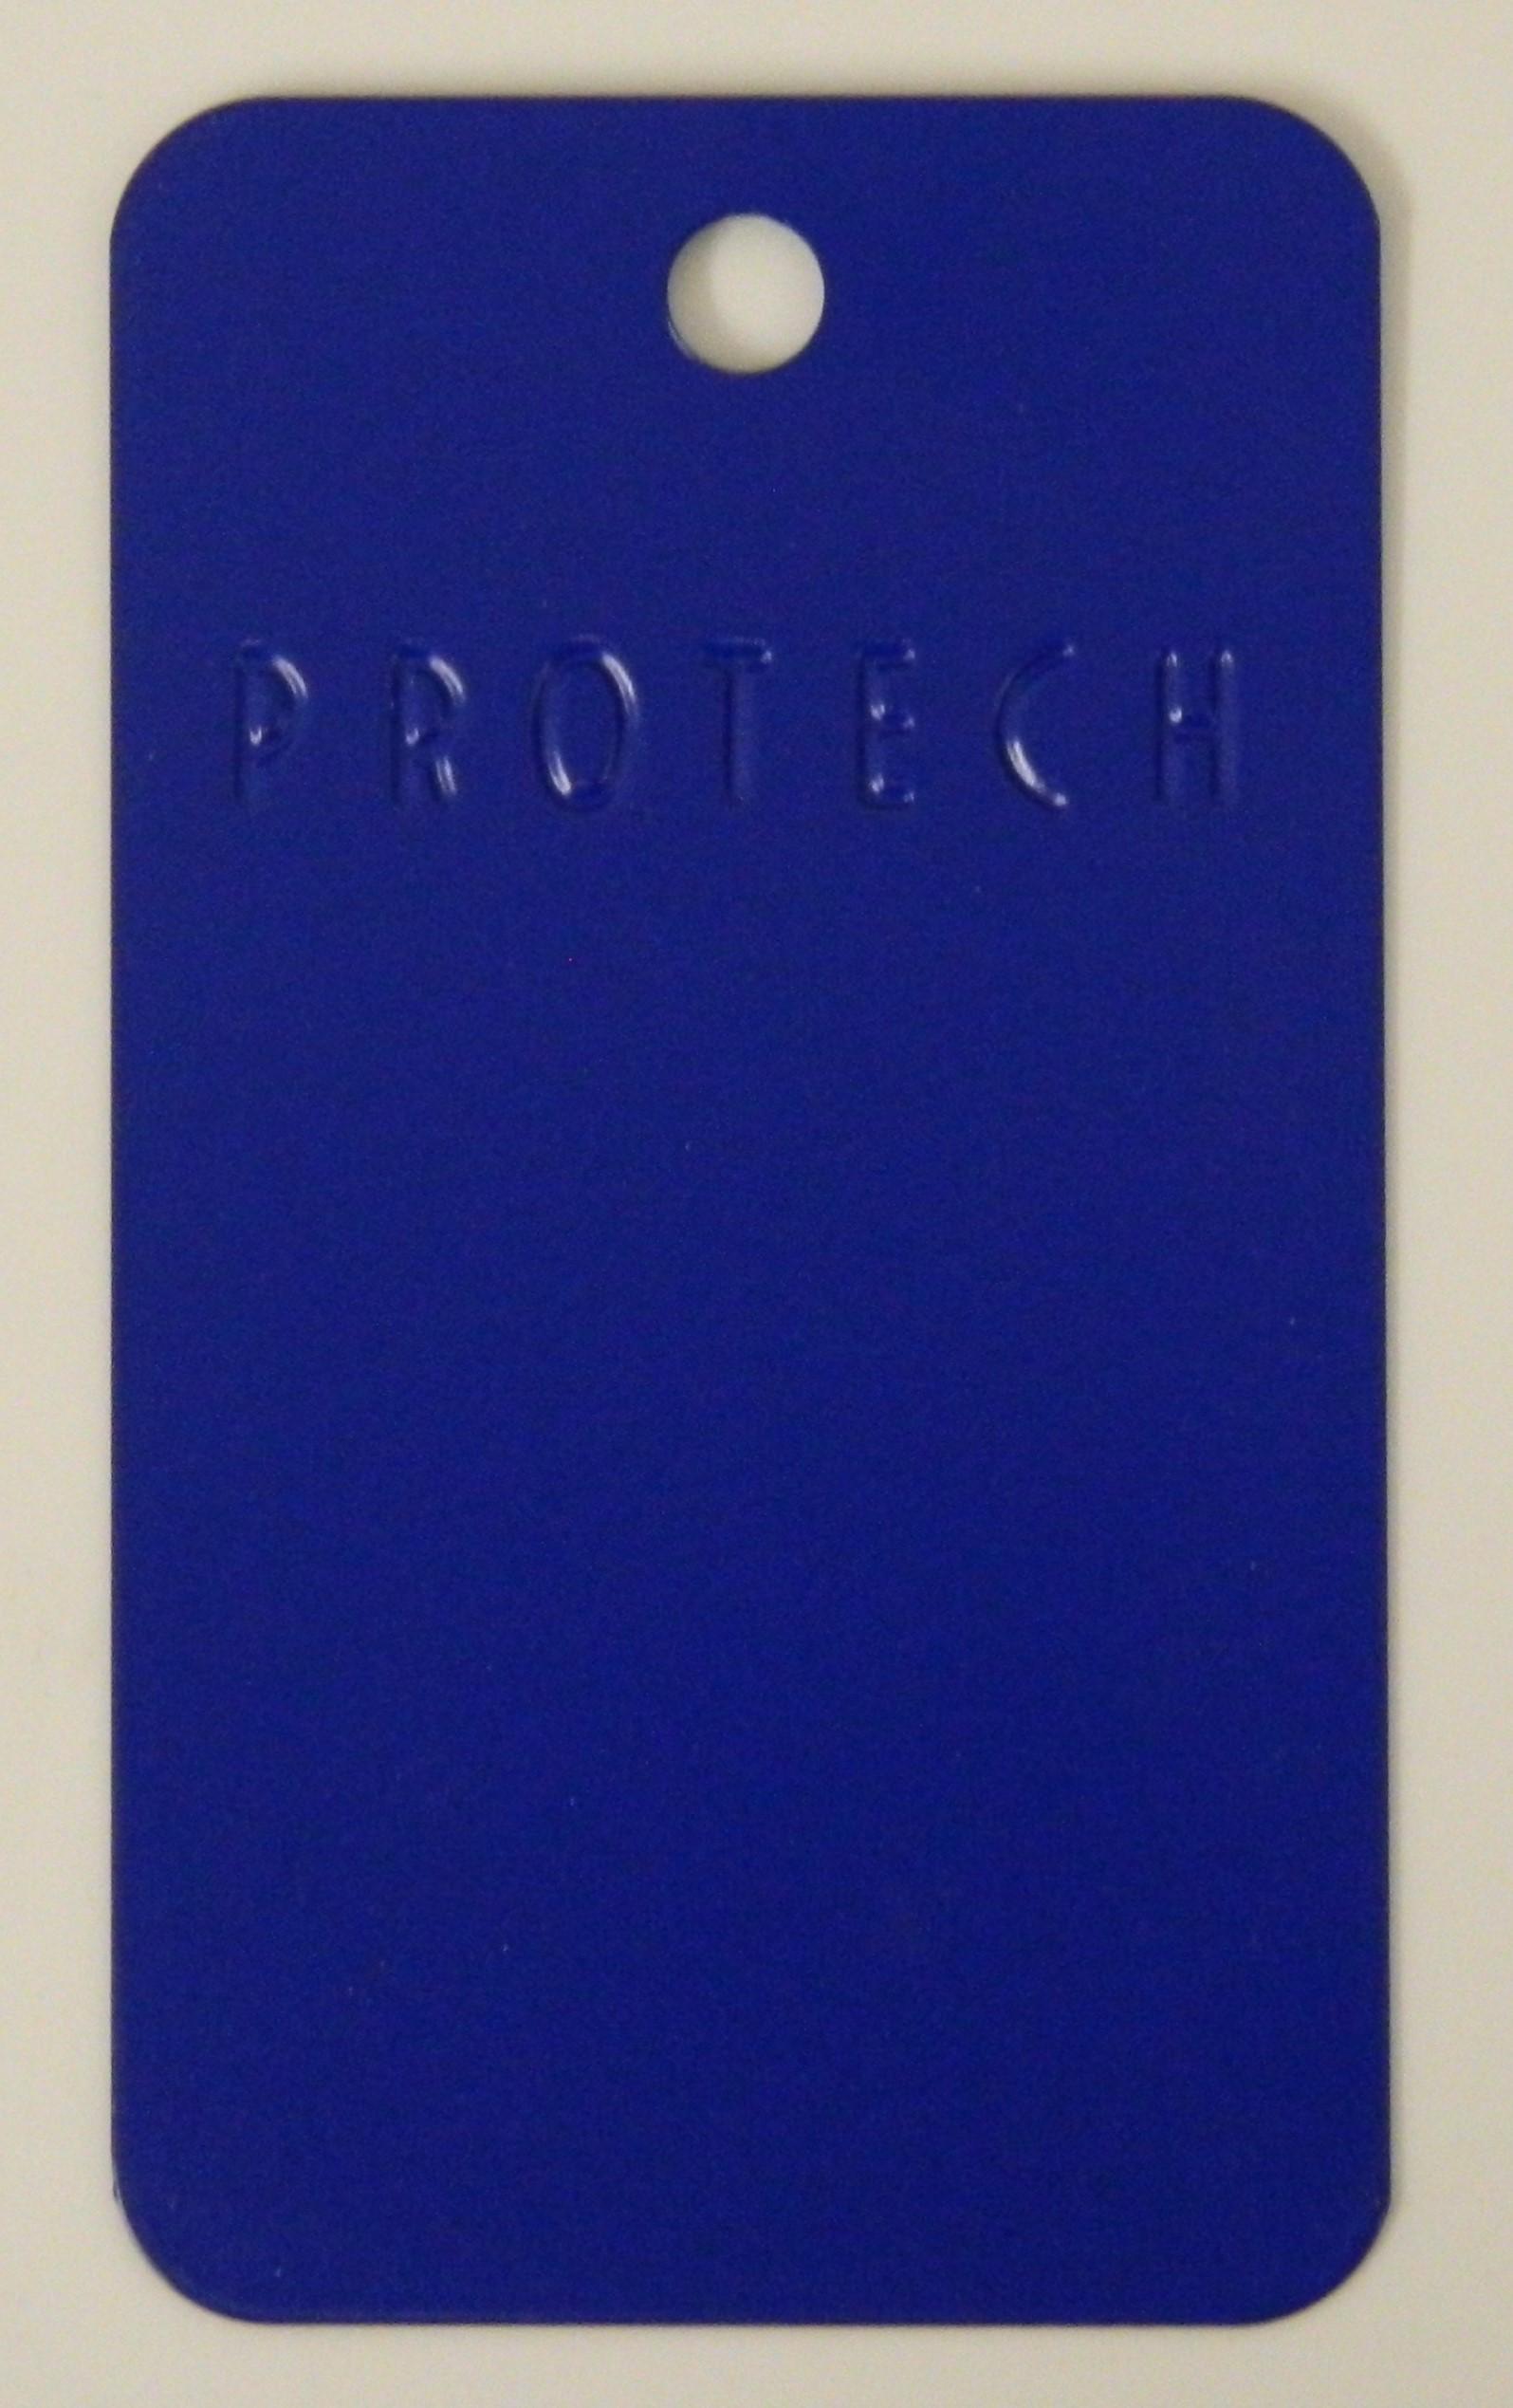 Sapphire High Gloss White Laminate Platform Bedroom Set: RAL 5003GL Sapphire Blue